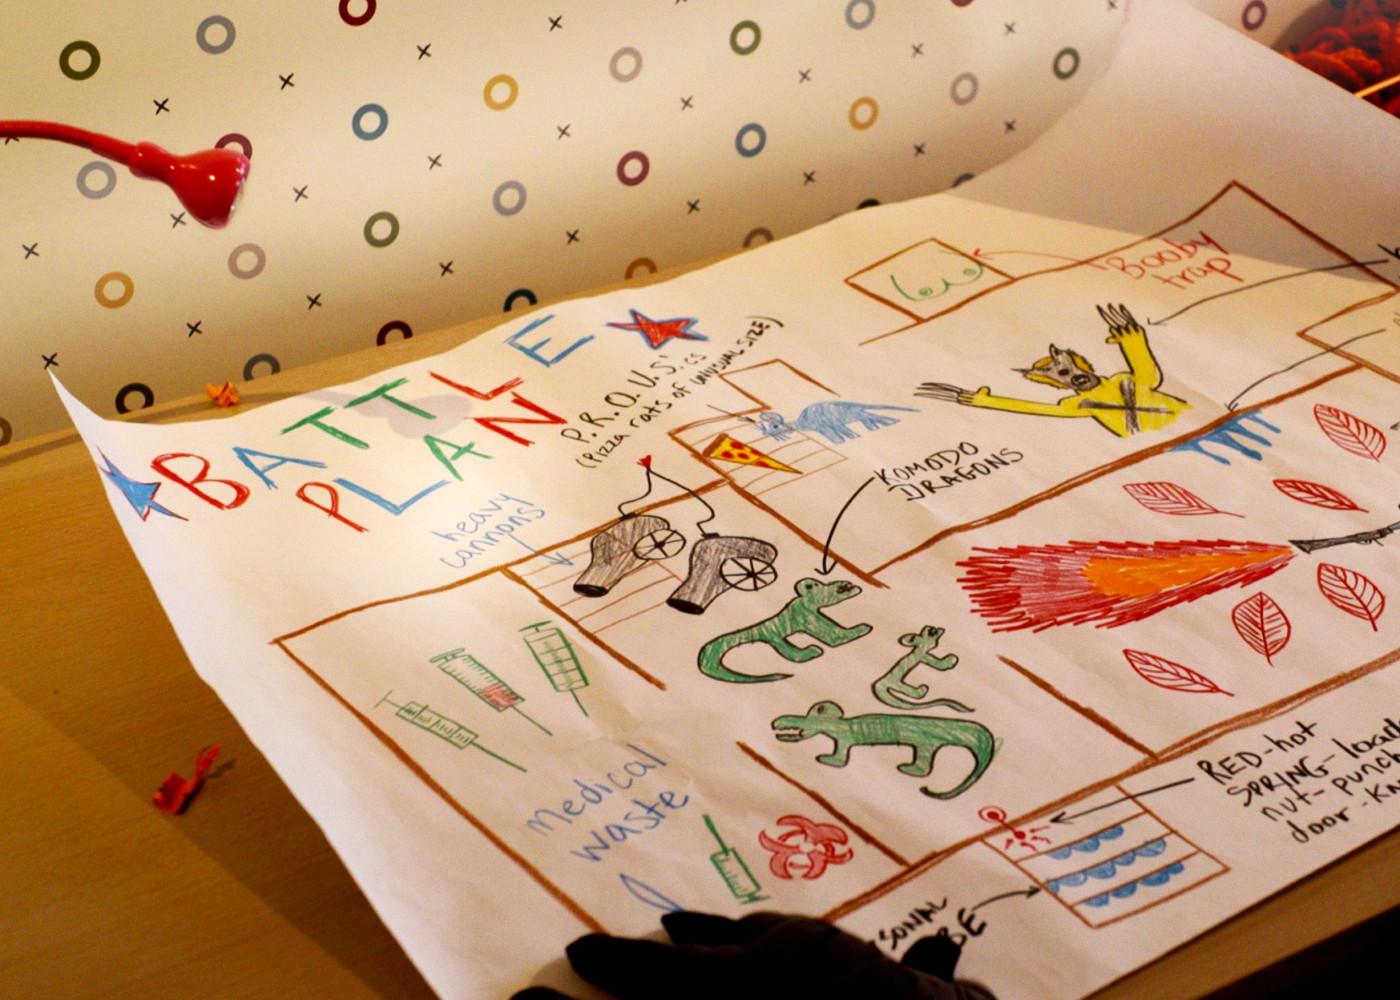 deadpool battle plan. deadpool santa ryan reynolds. deadpool. #12daysofChristmas. 20th century fox. marvel. the action pixel. @theactionpixel